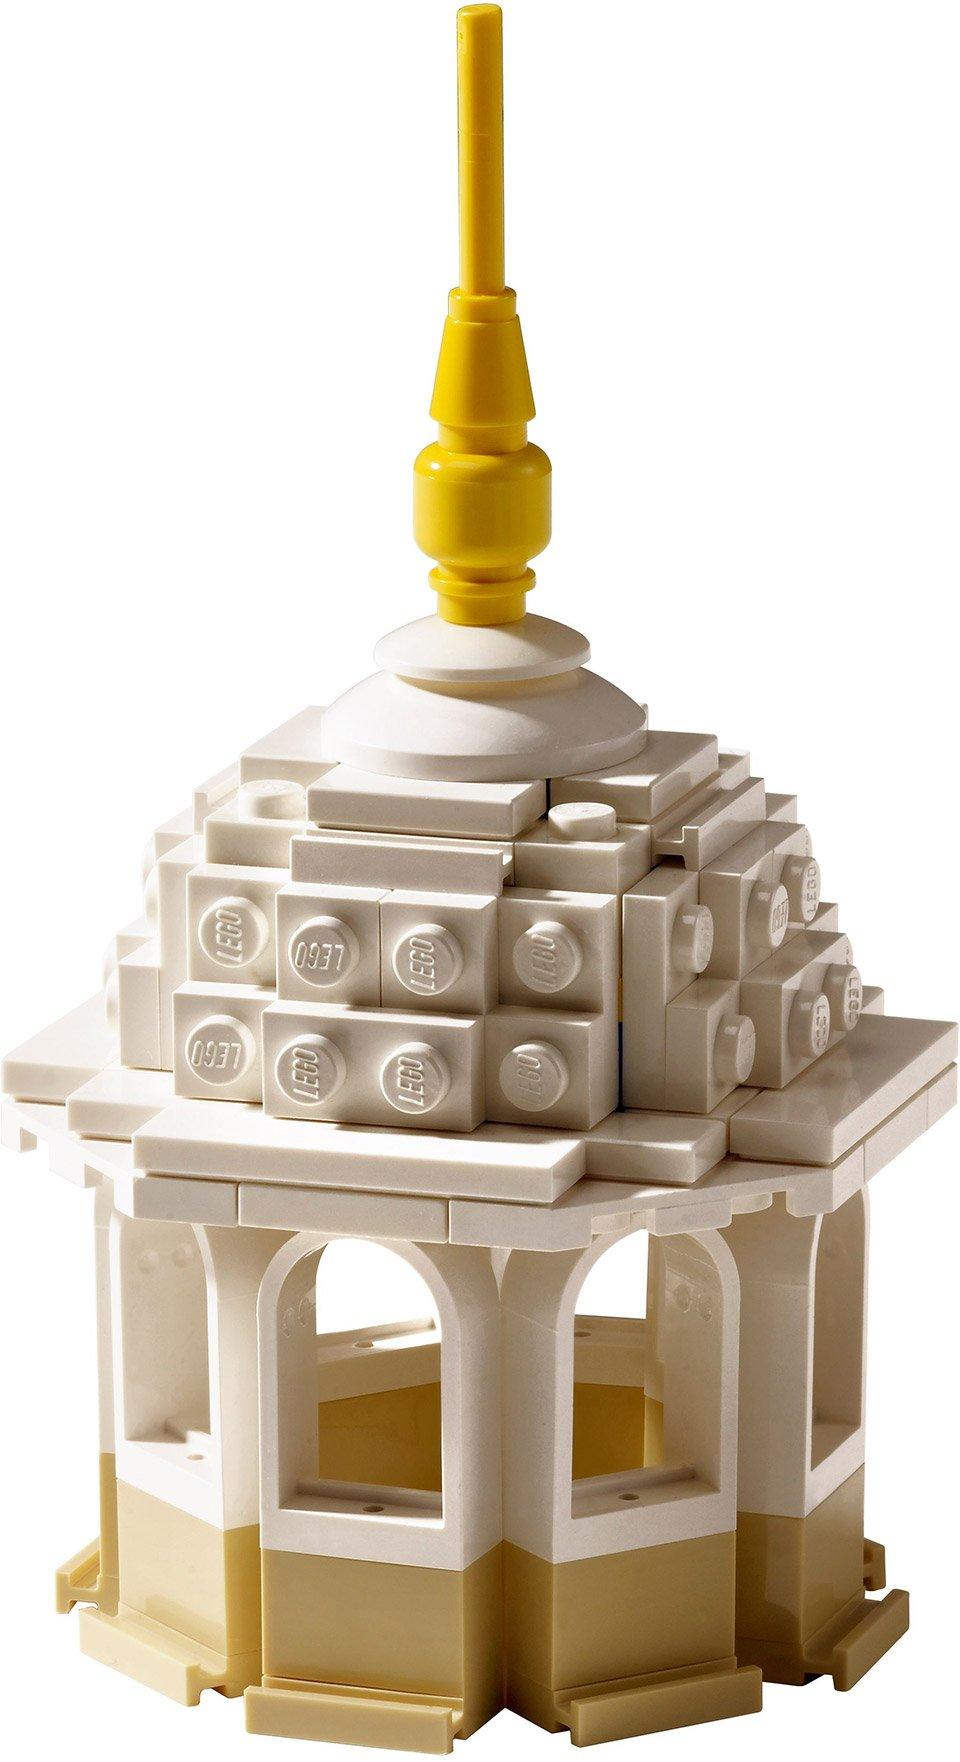 LEGO Creator Taj Mahal Rerelease